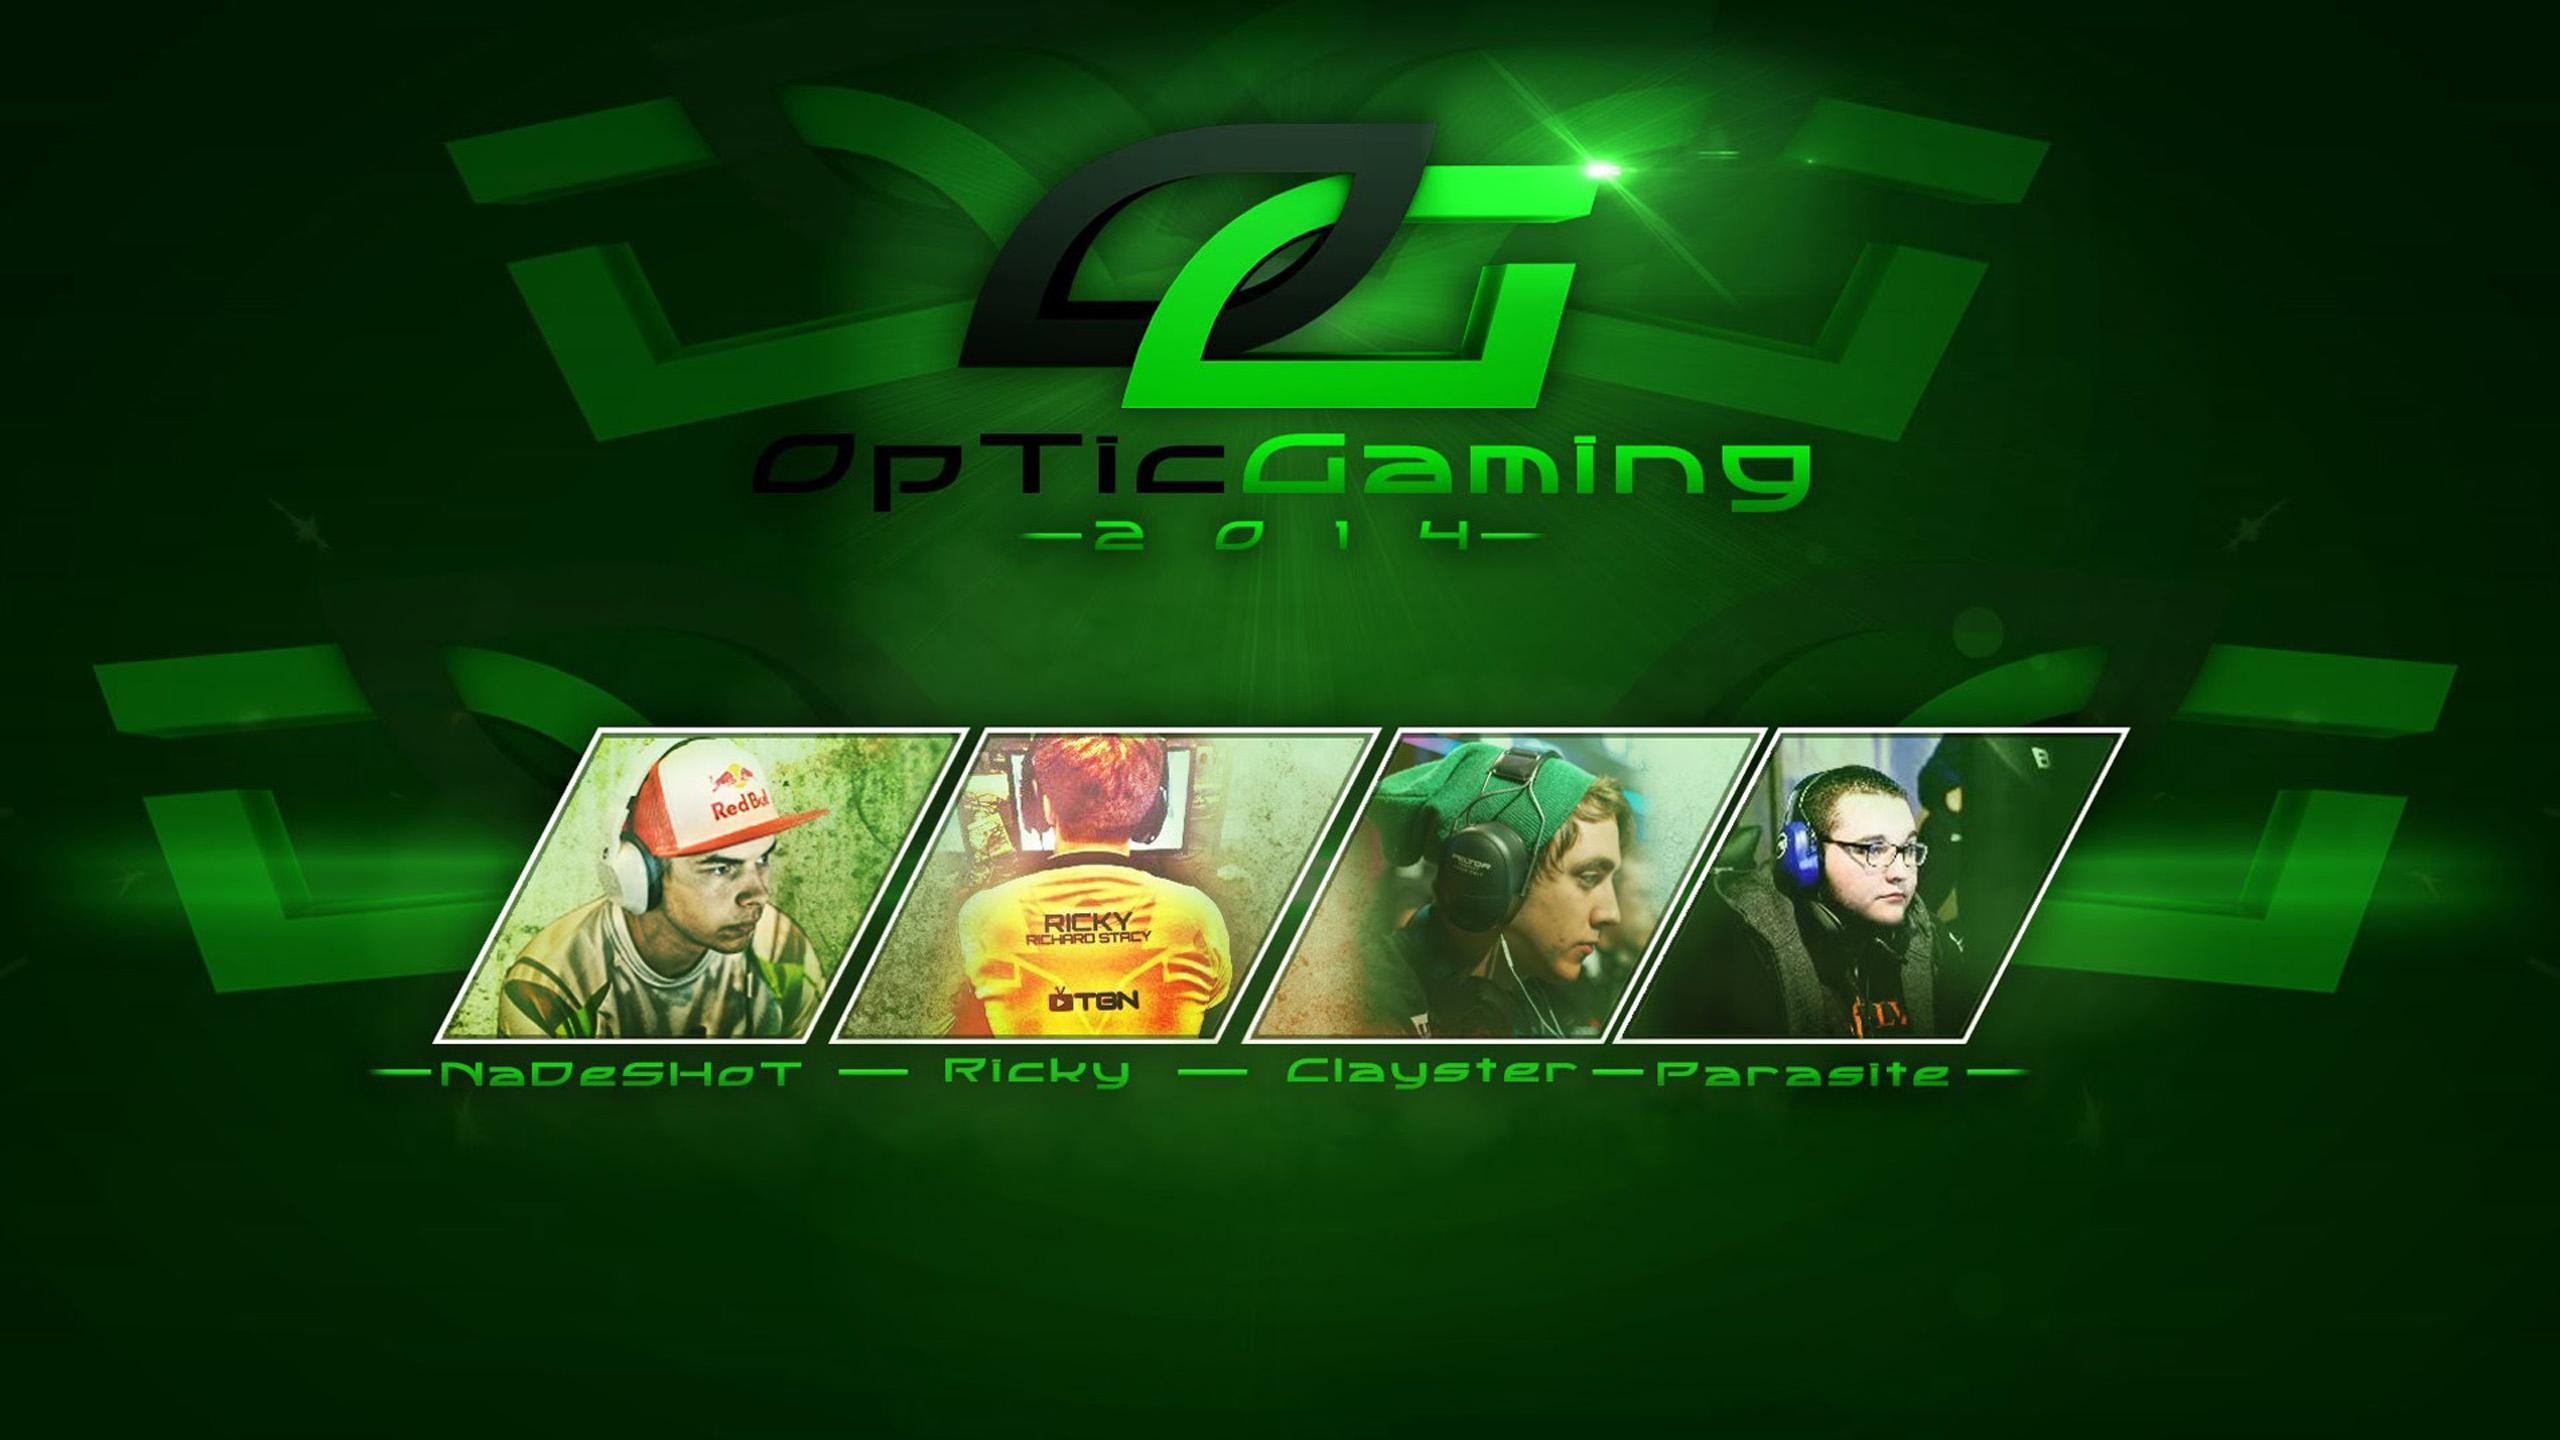 Optic Gaming Background 2560x1440 Download Hd Wallpaper Wallpapertip